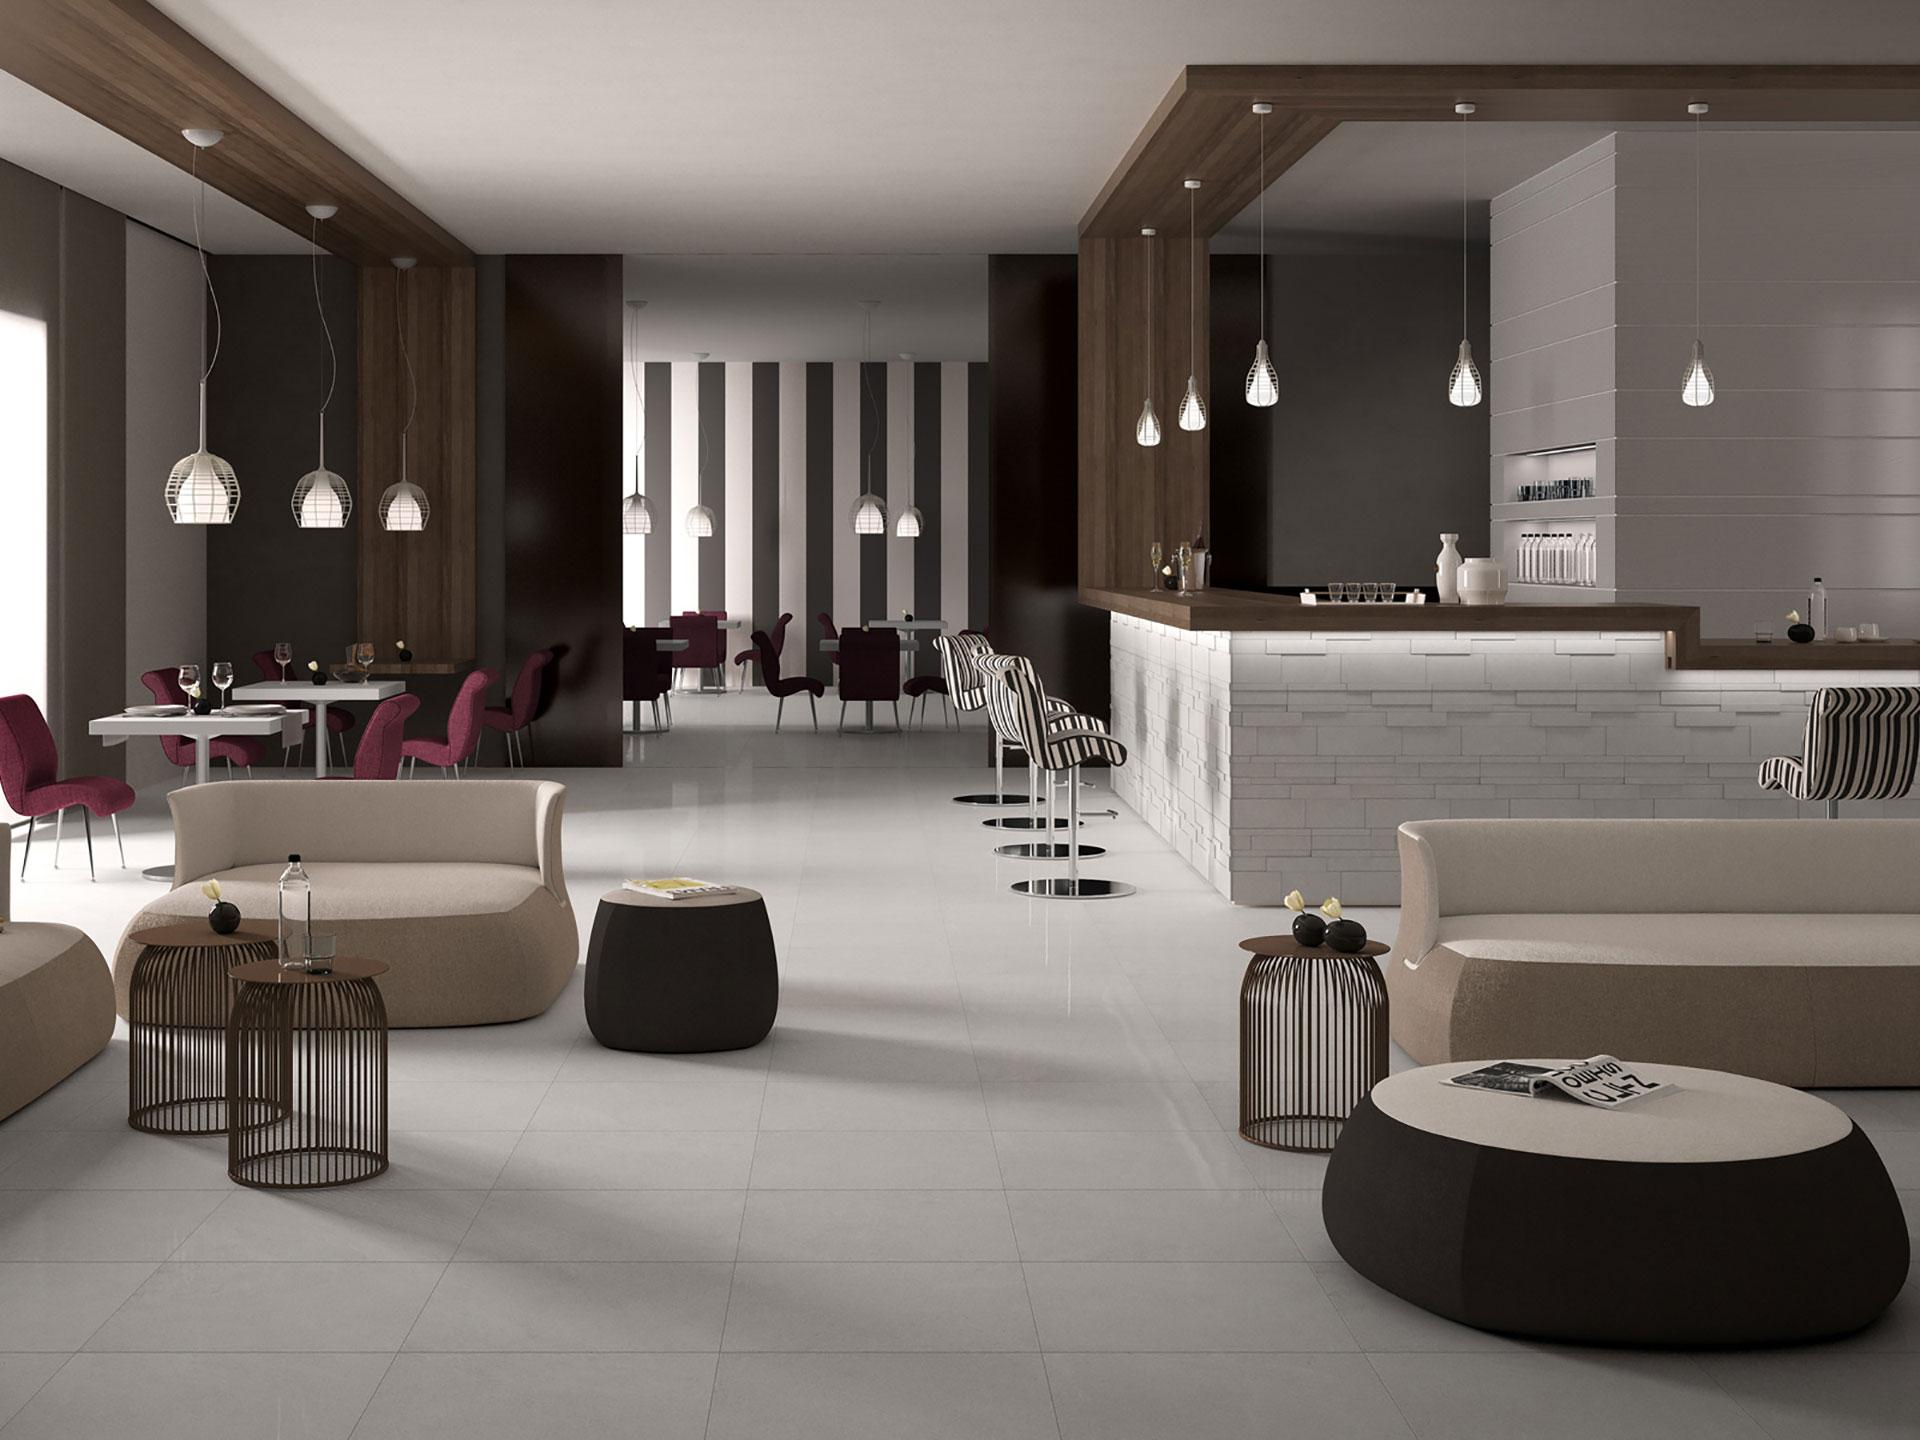 Contact Us | Select Ceramic Tile